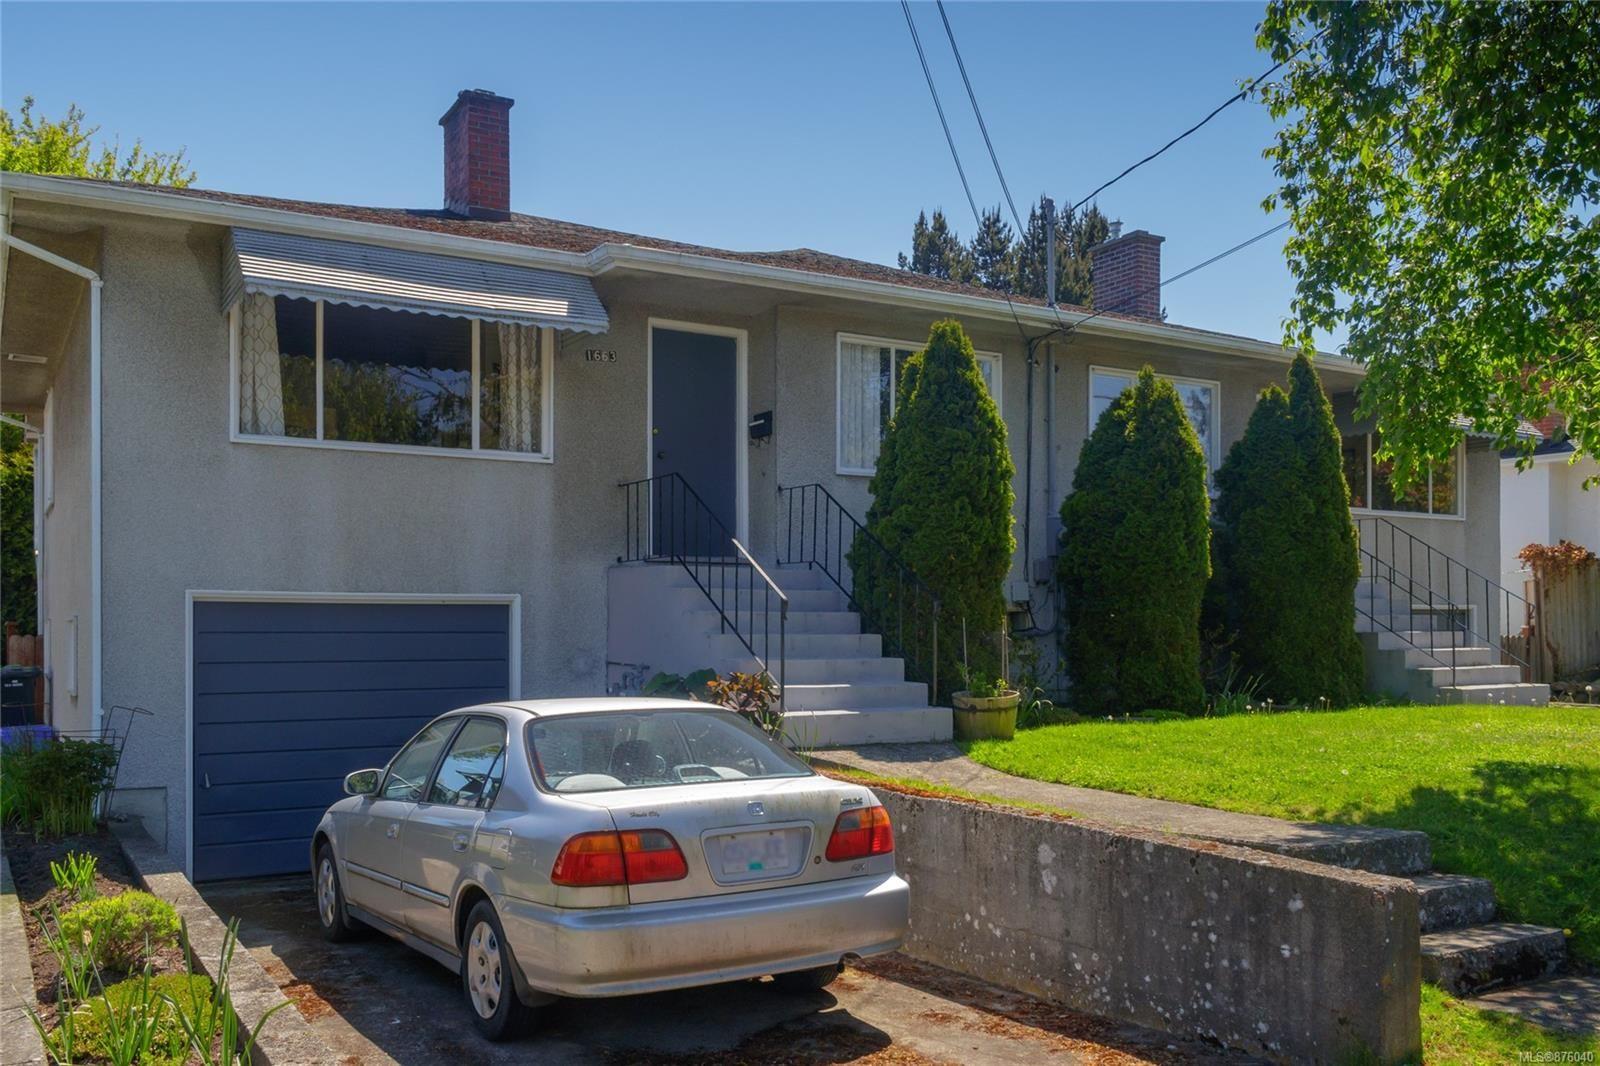 Main Photo: 1661/1663 Richardson St in : Vi Fairfield West Full Duplex for sale (Victoria)  : MLS®# 876040